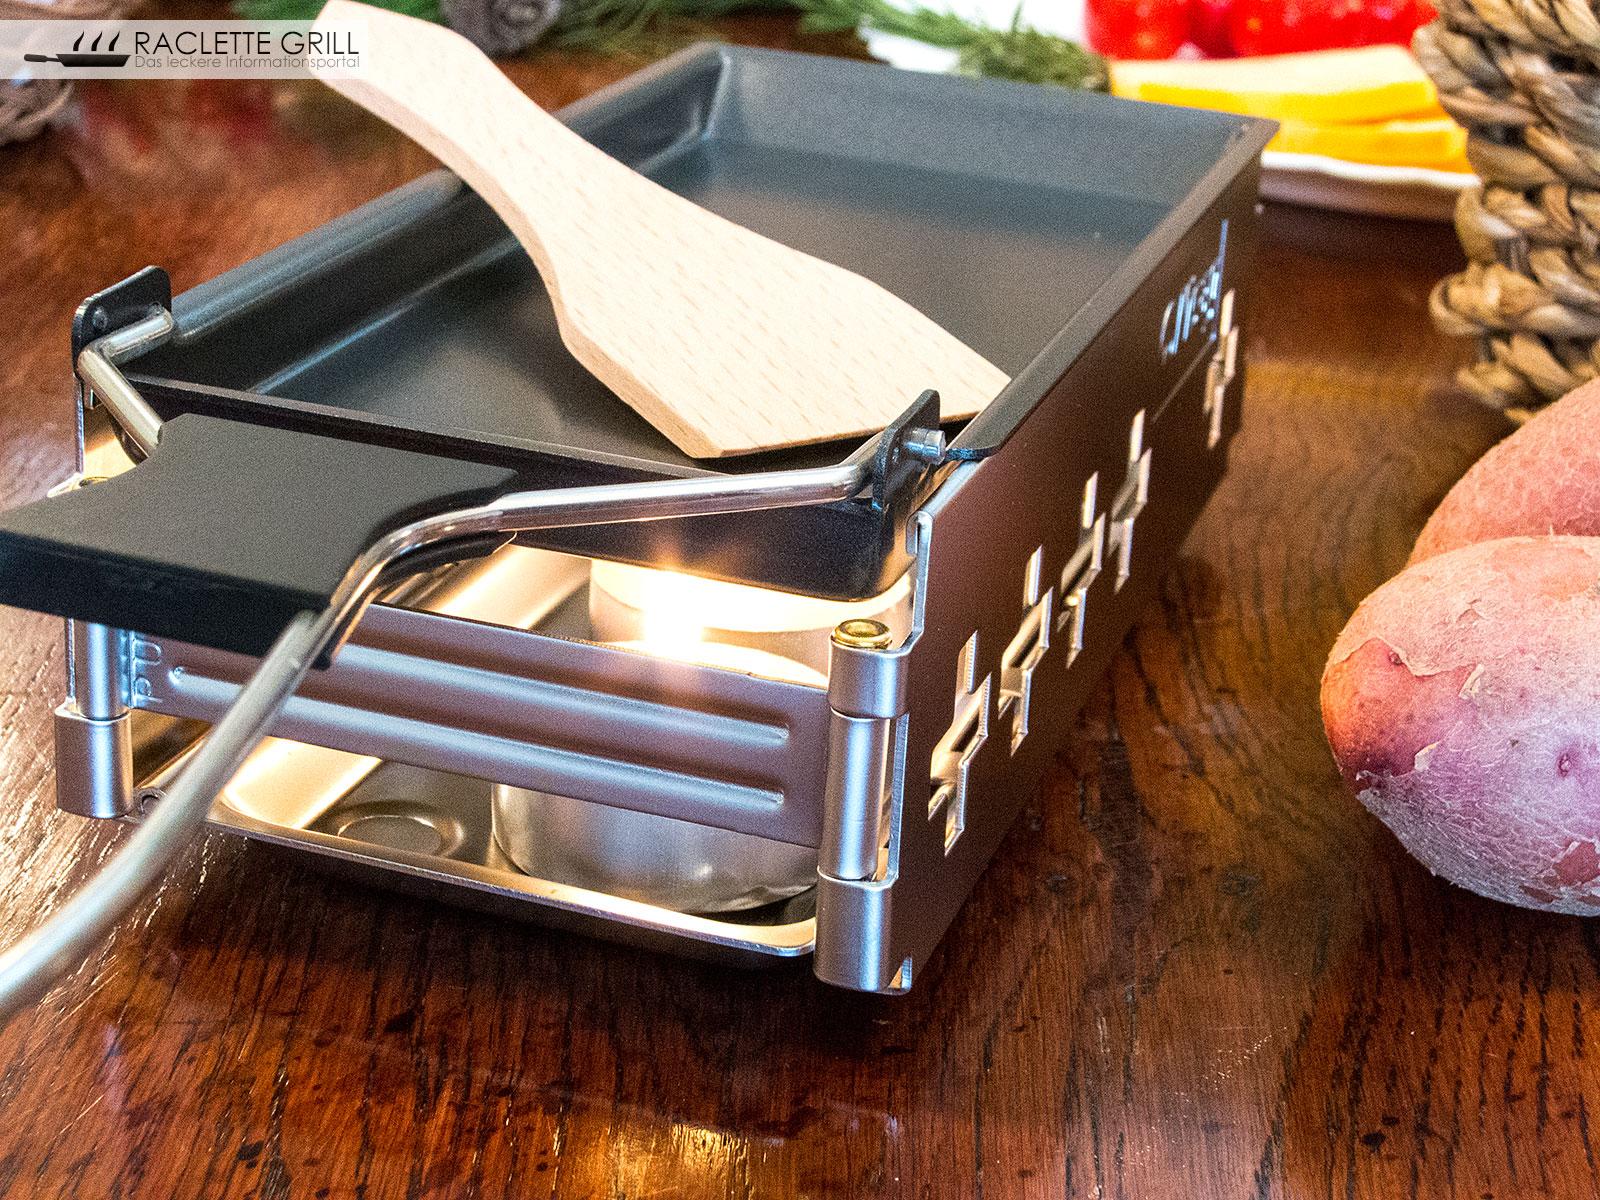 raclette candle light testbericht raclette mit teelichtern. Black Bedroom Furniture Sets. Home Design Ideas